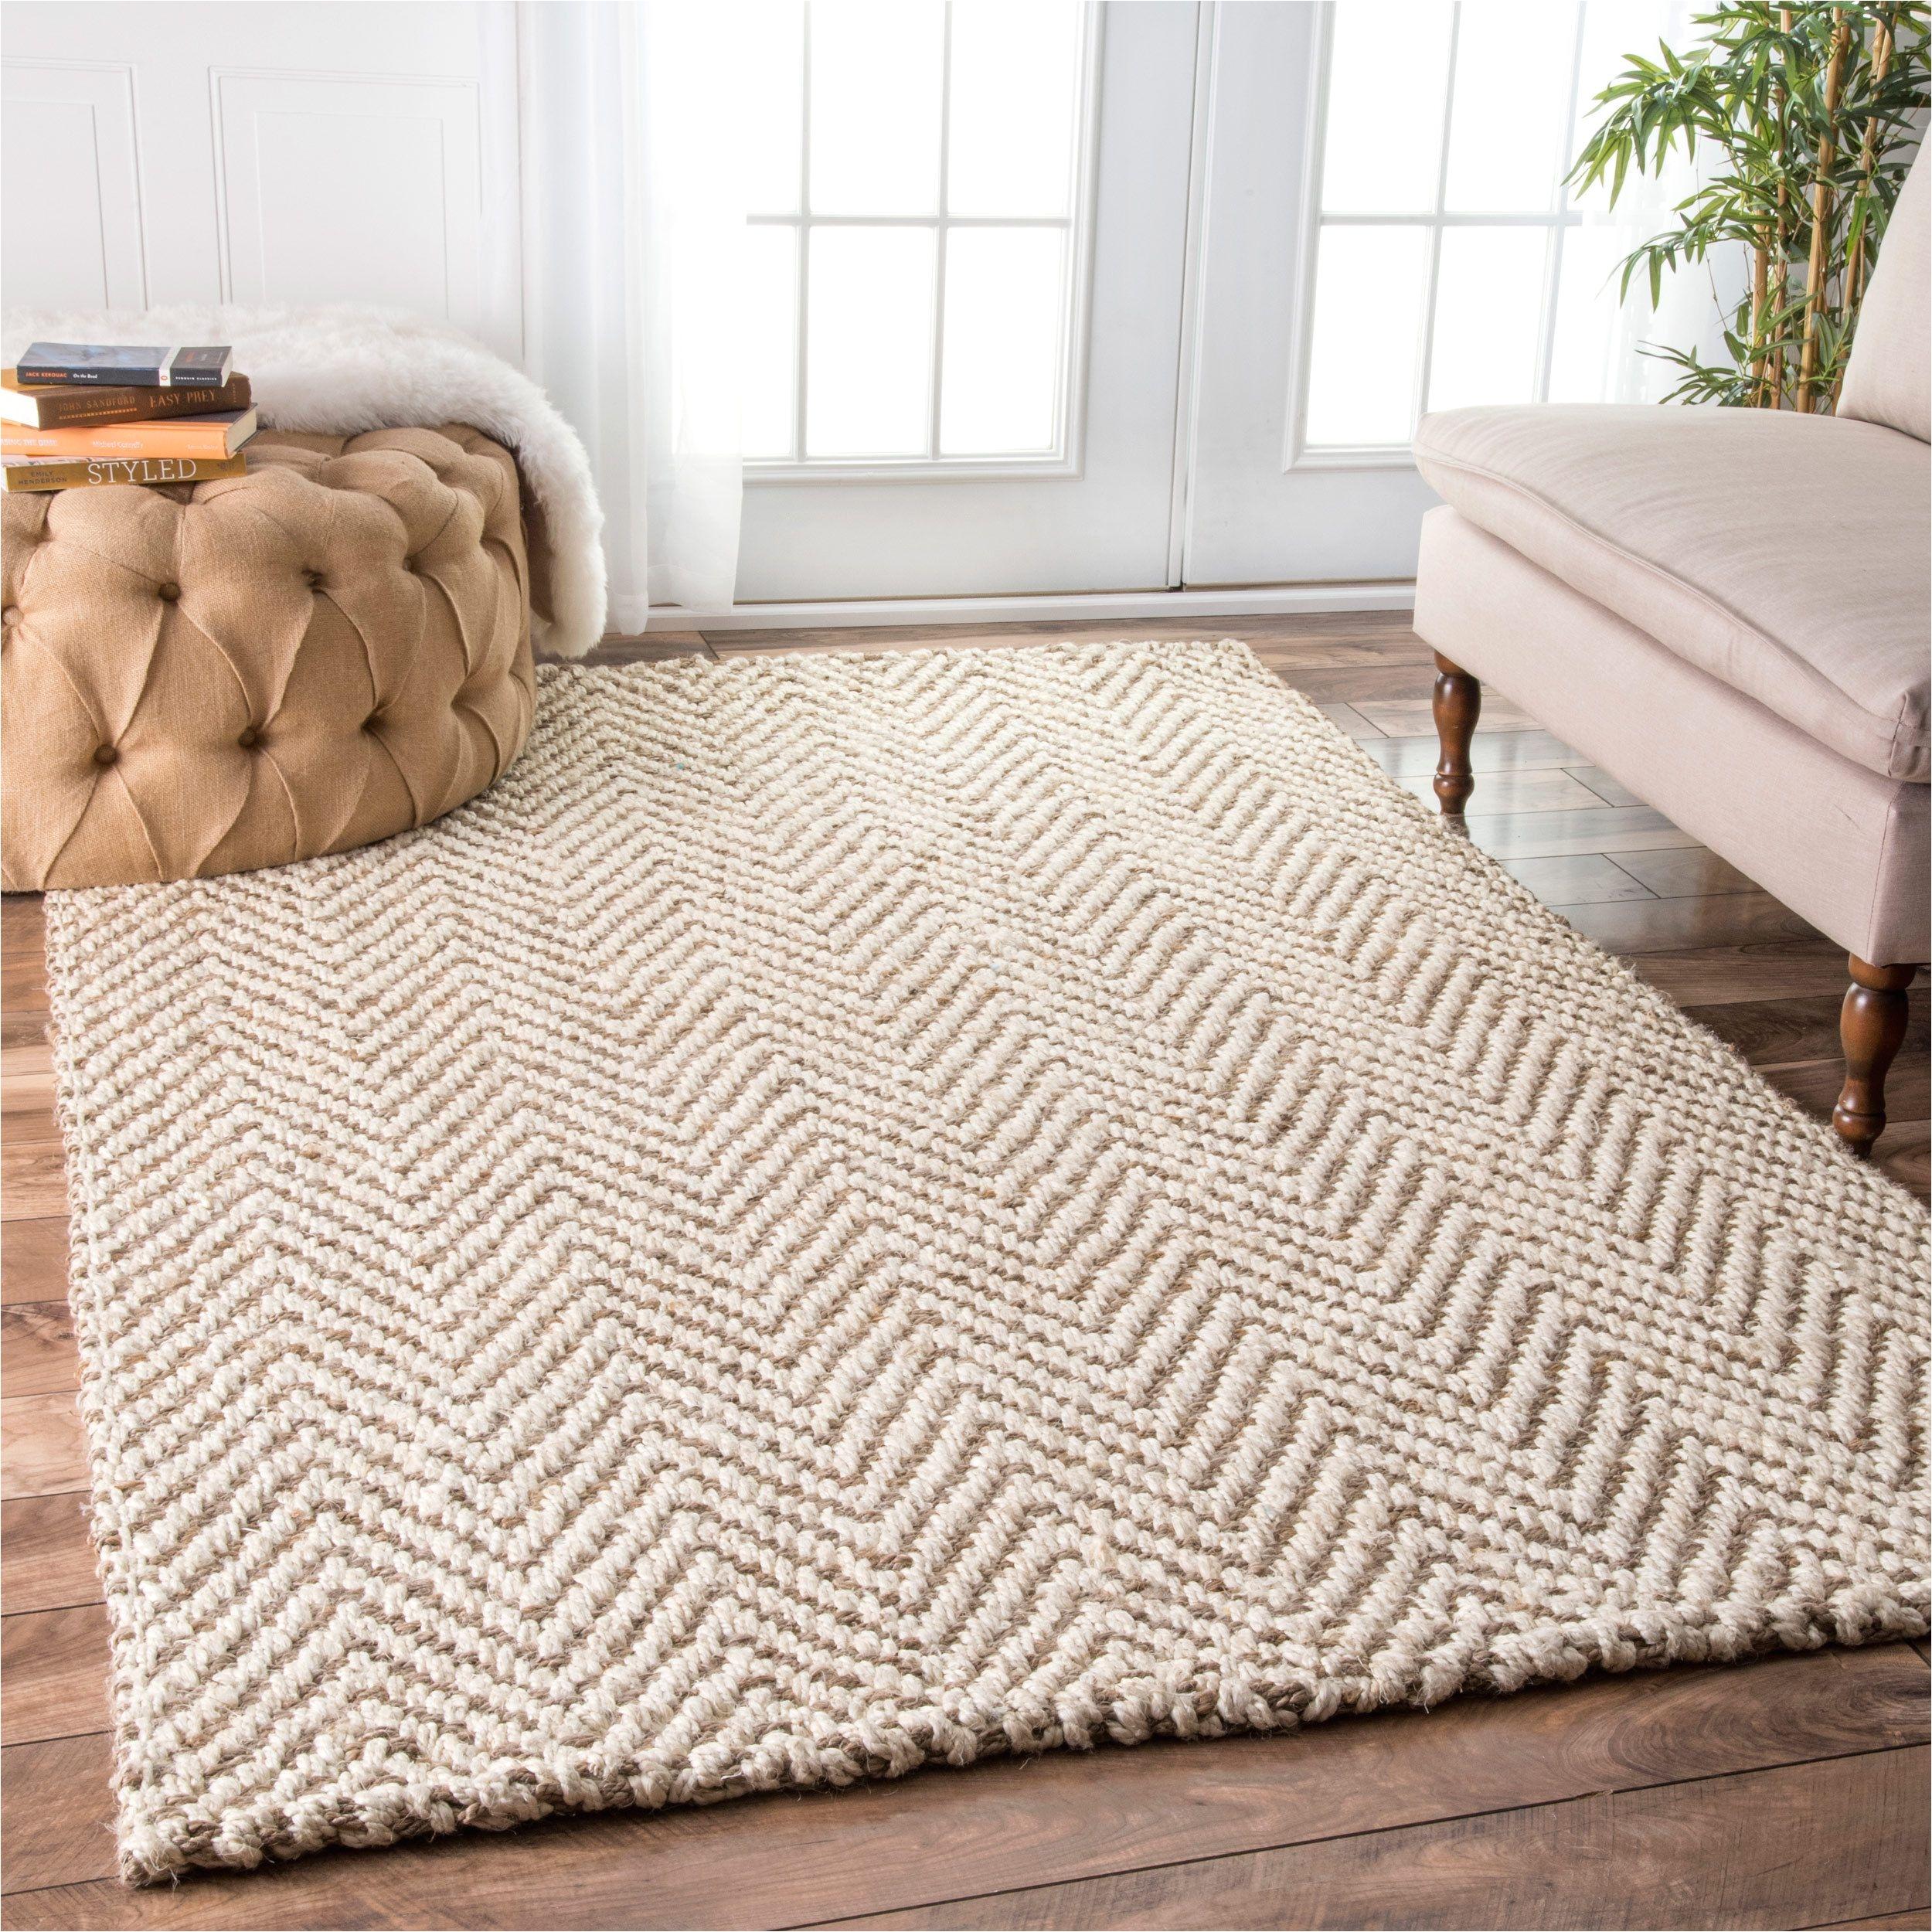 handmade nuloom eco natural fiber jute chevron ivory rug 8 6 x 11 6 ivory size 9 x 12